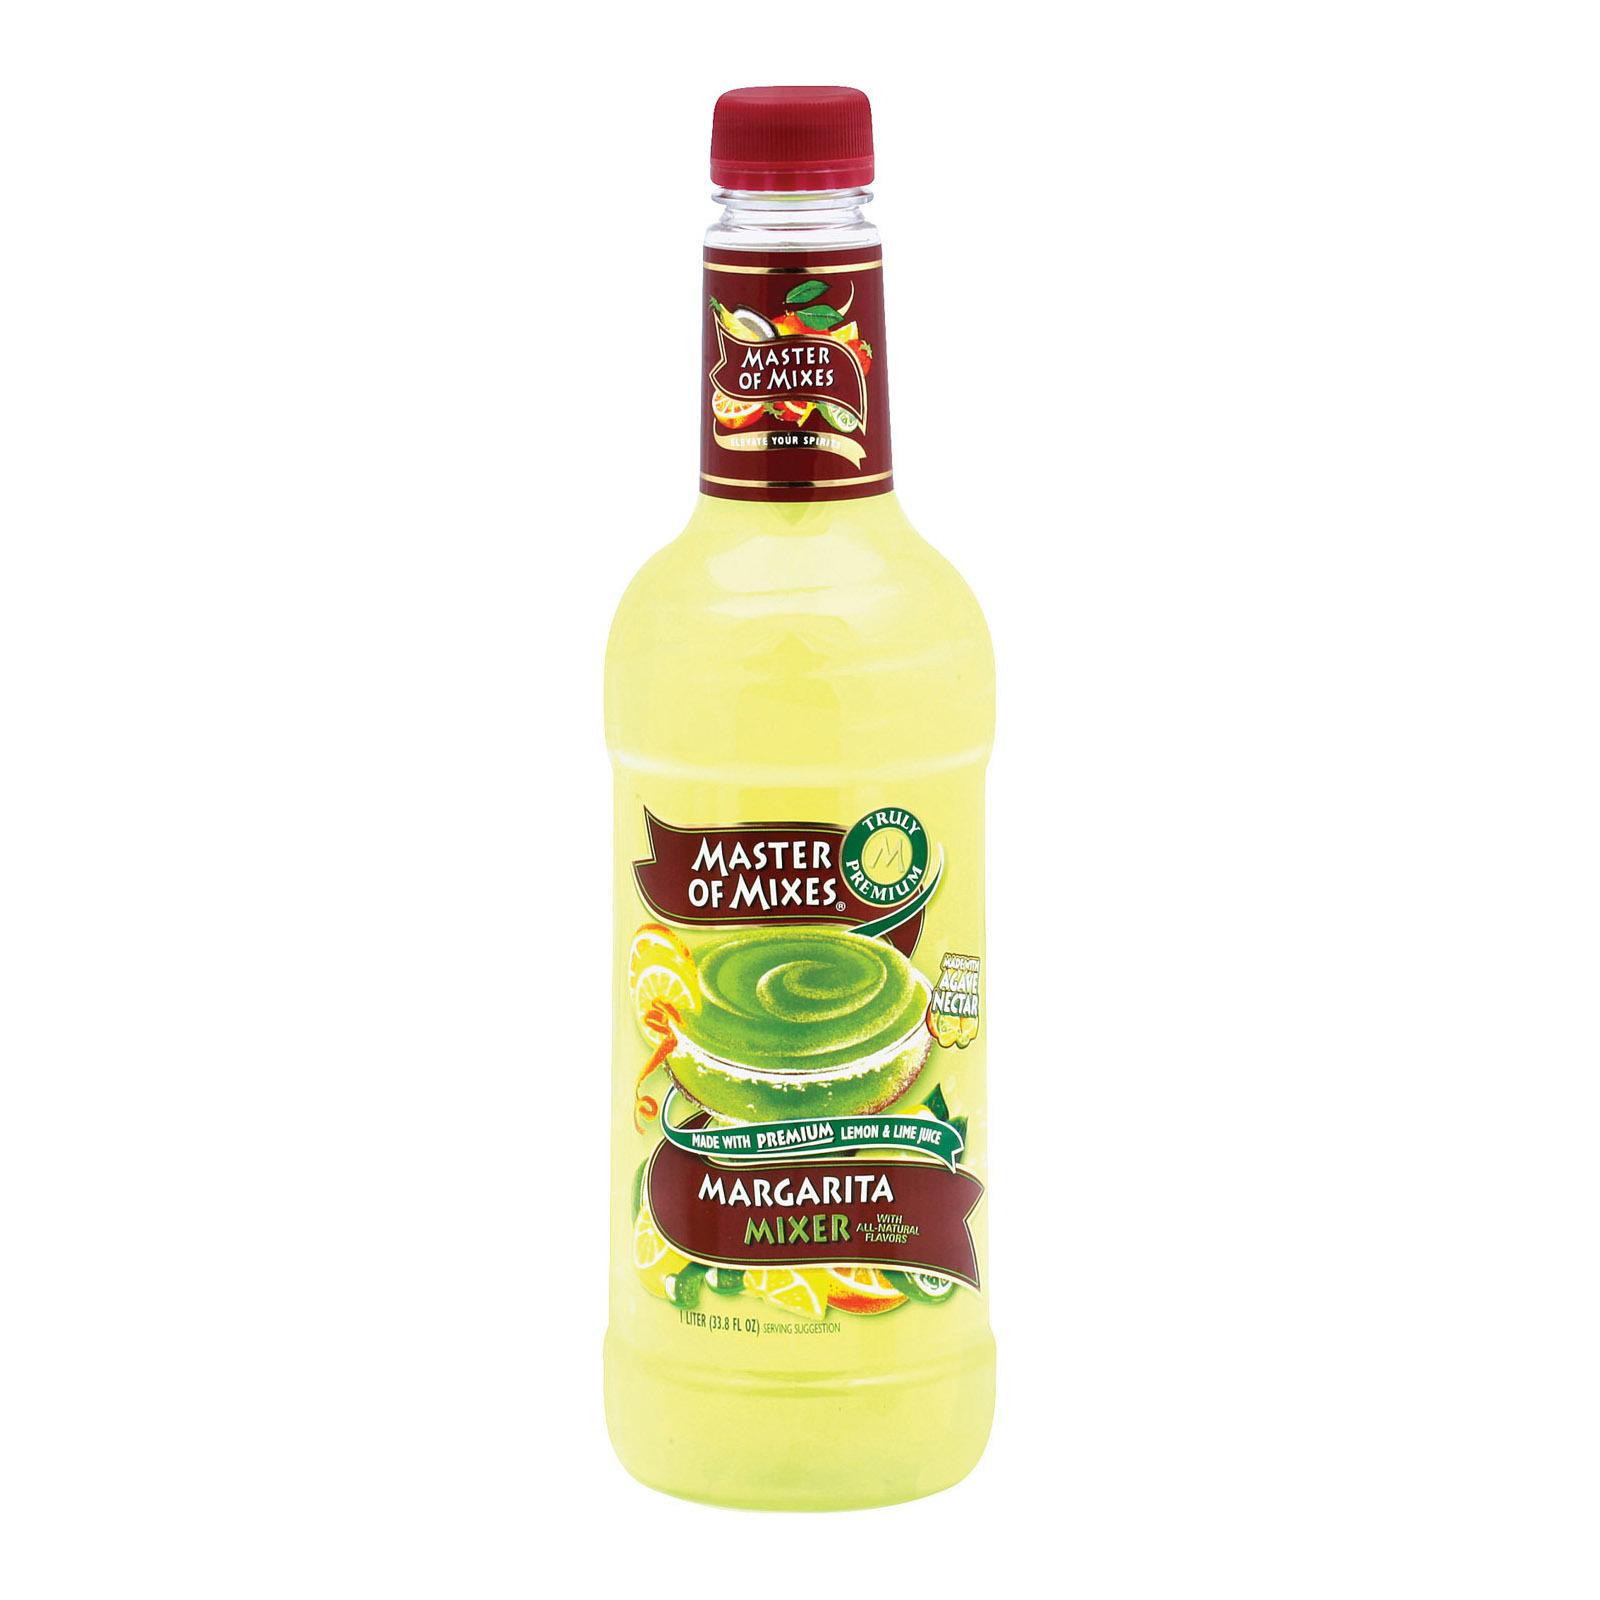 Master of Mixes Margarita Mixer - Case of 12 - 33.8 Fl oz.